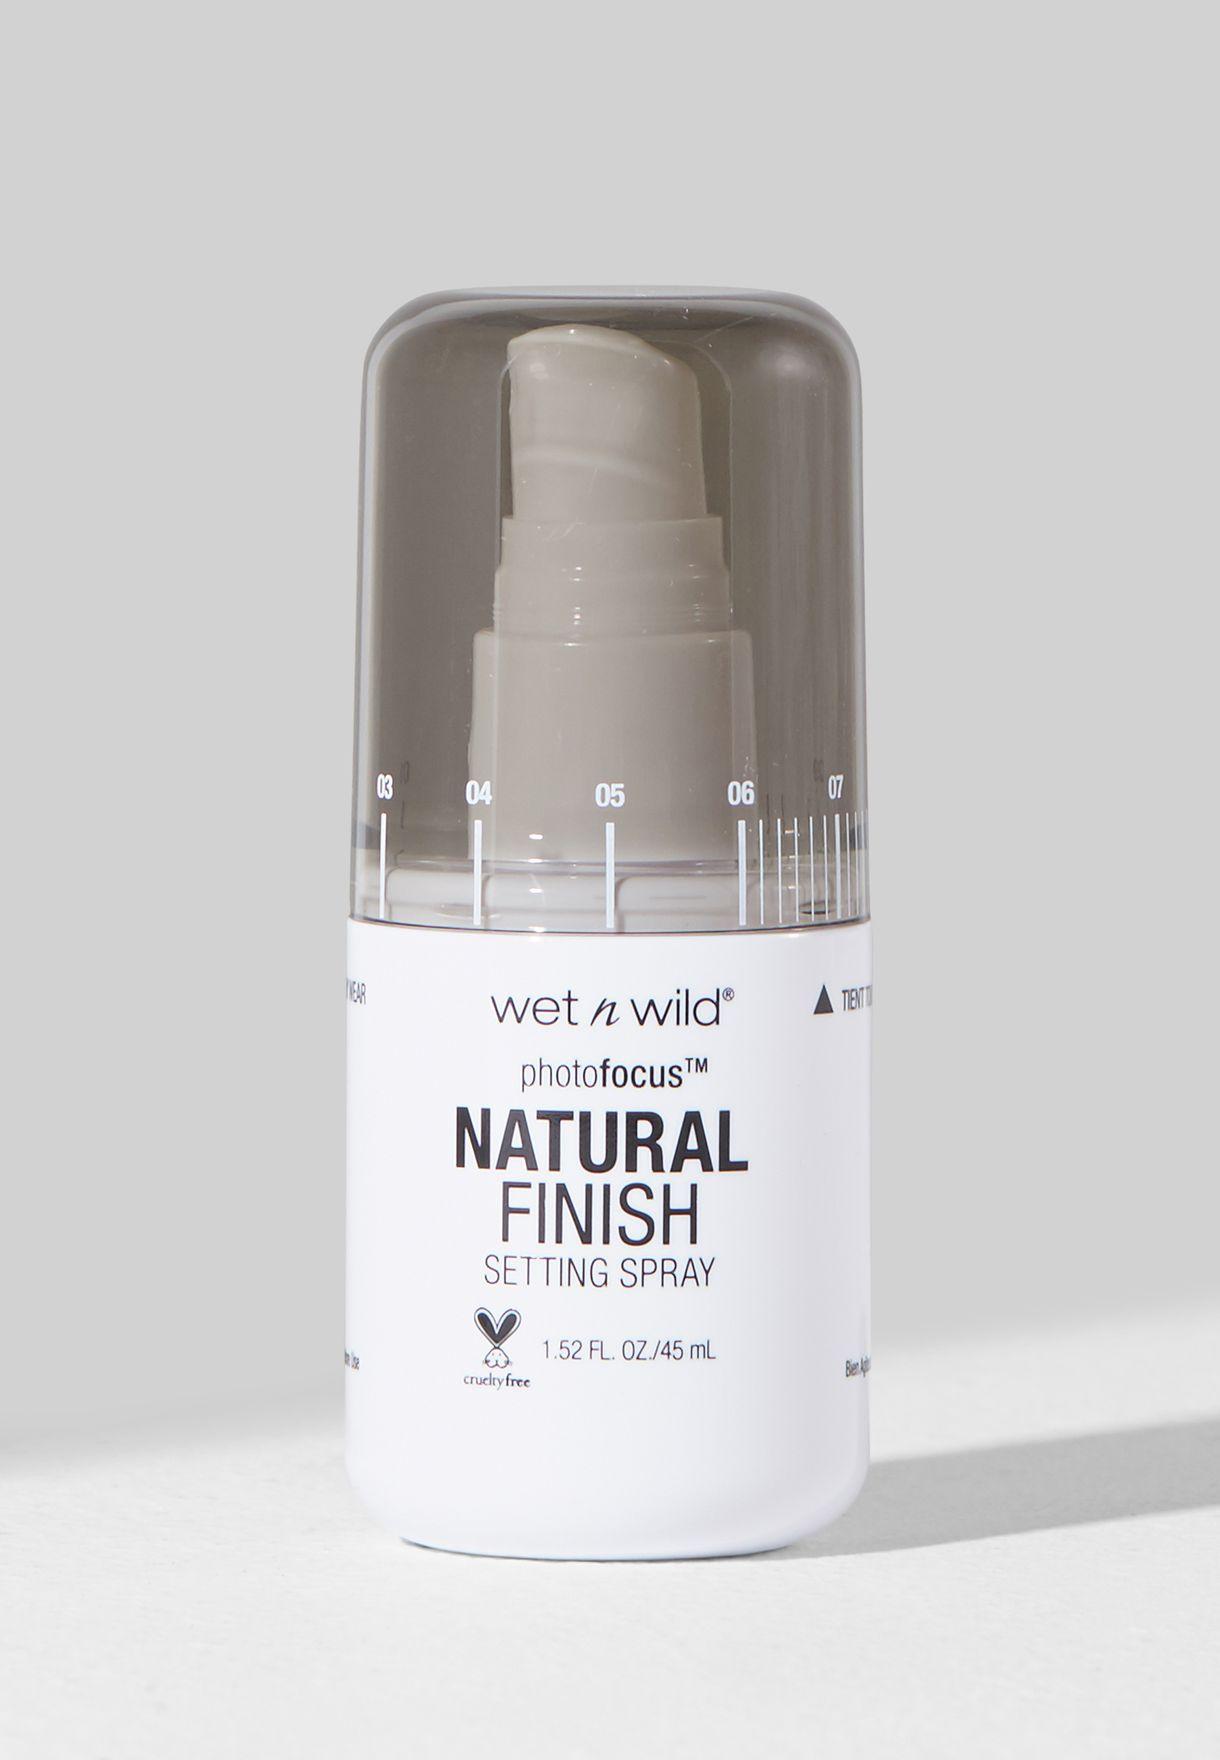 Natural Finish Setting Spray